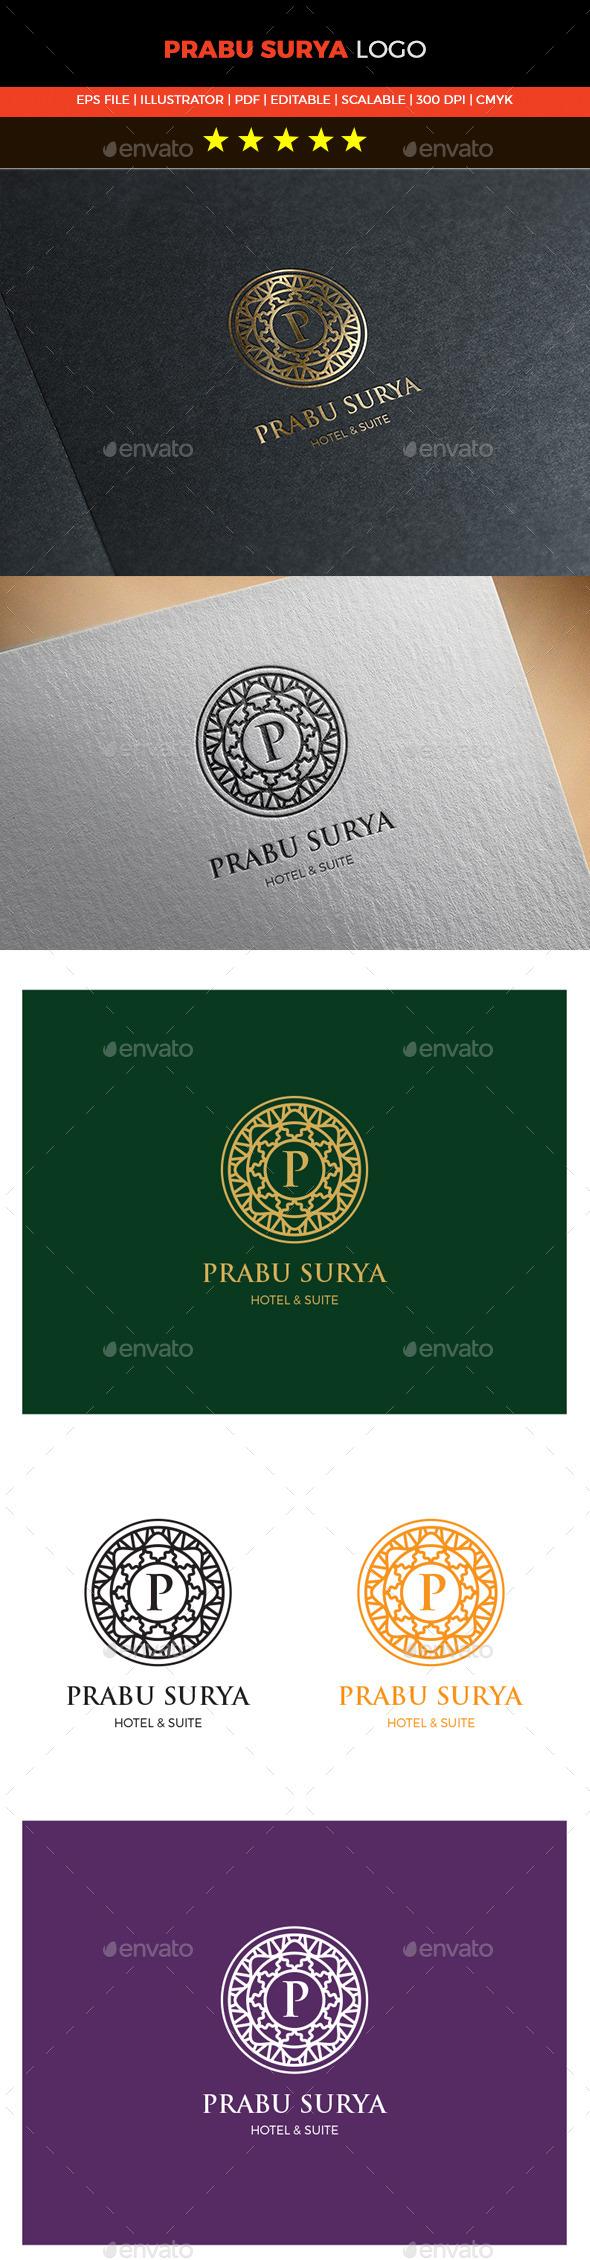 GraphicRiver Prabu Surya Logo 10599404